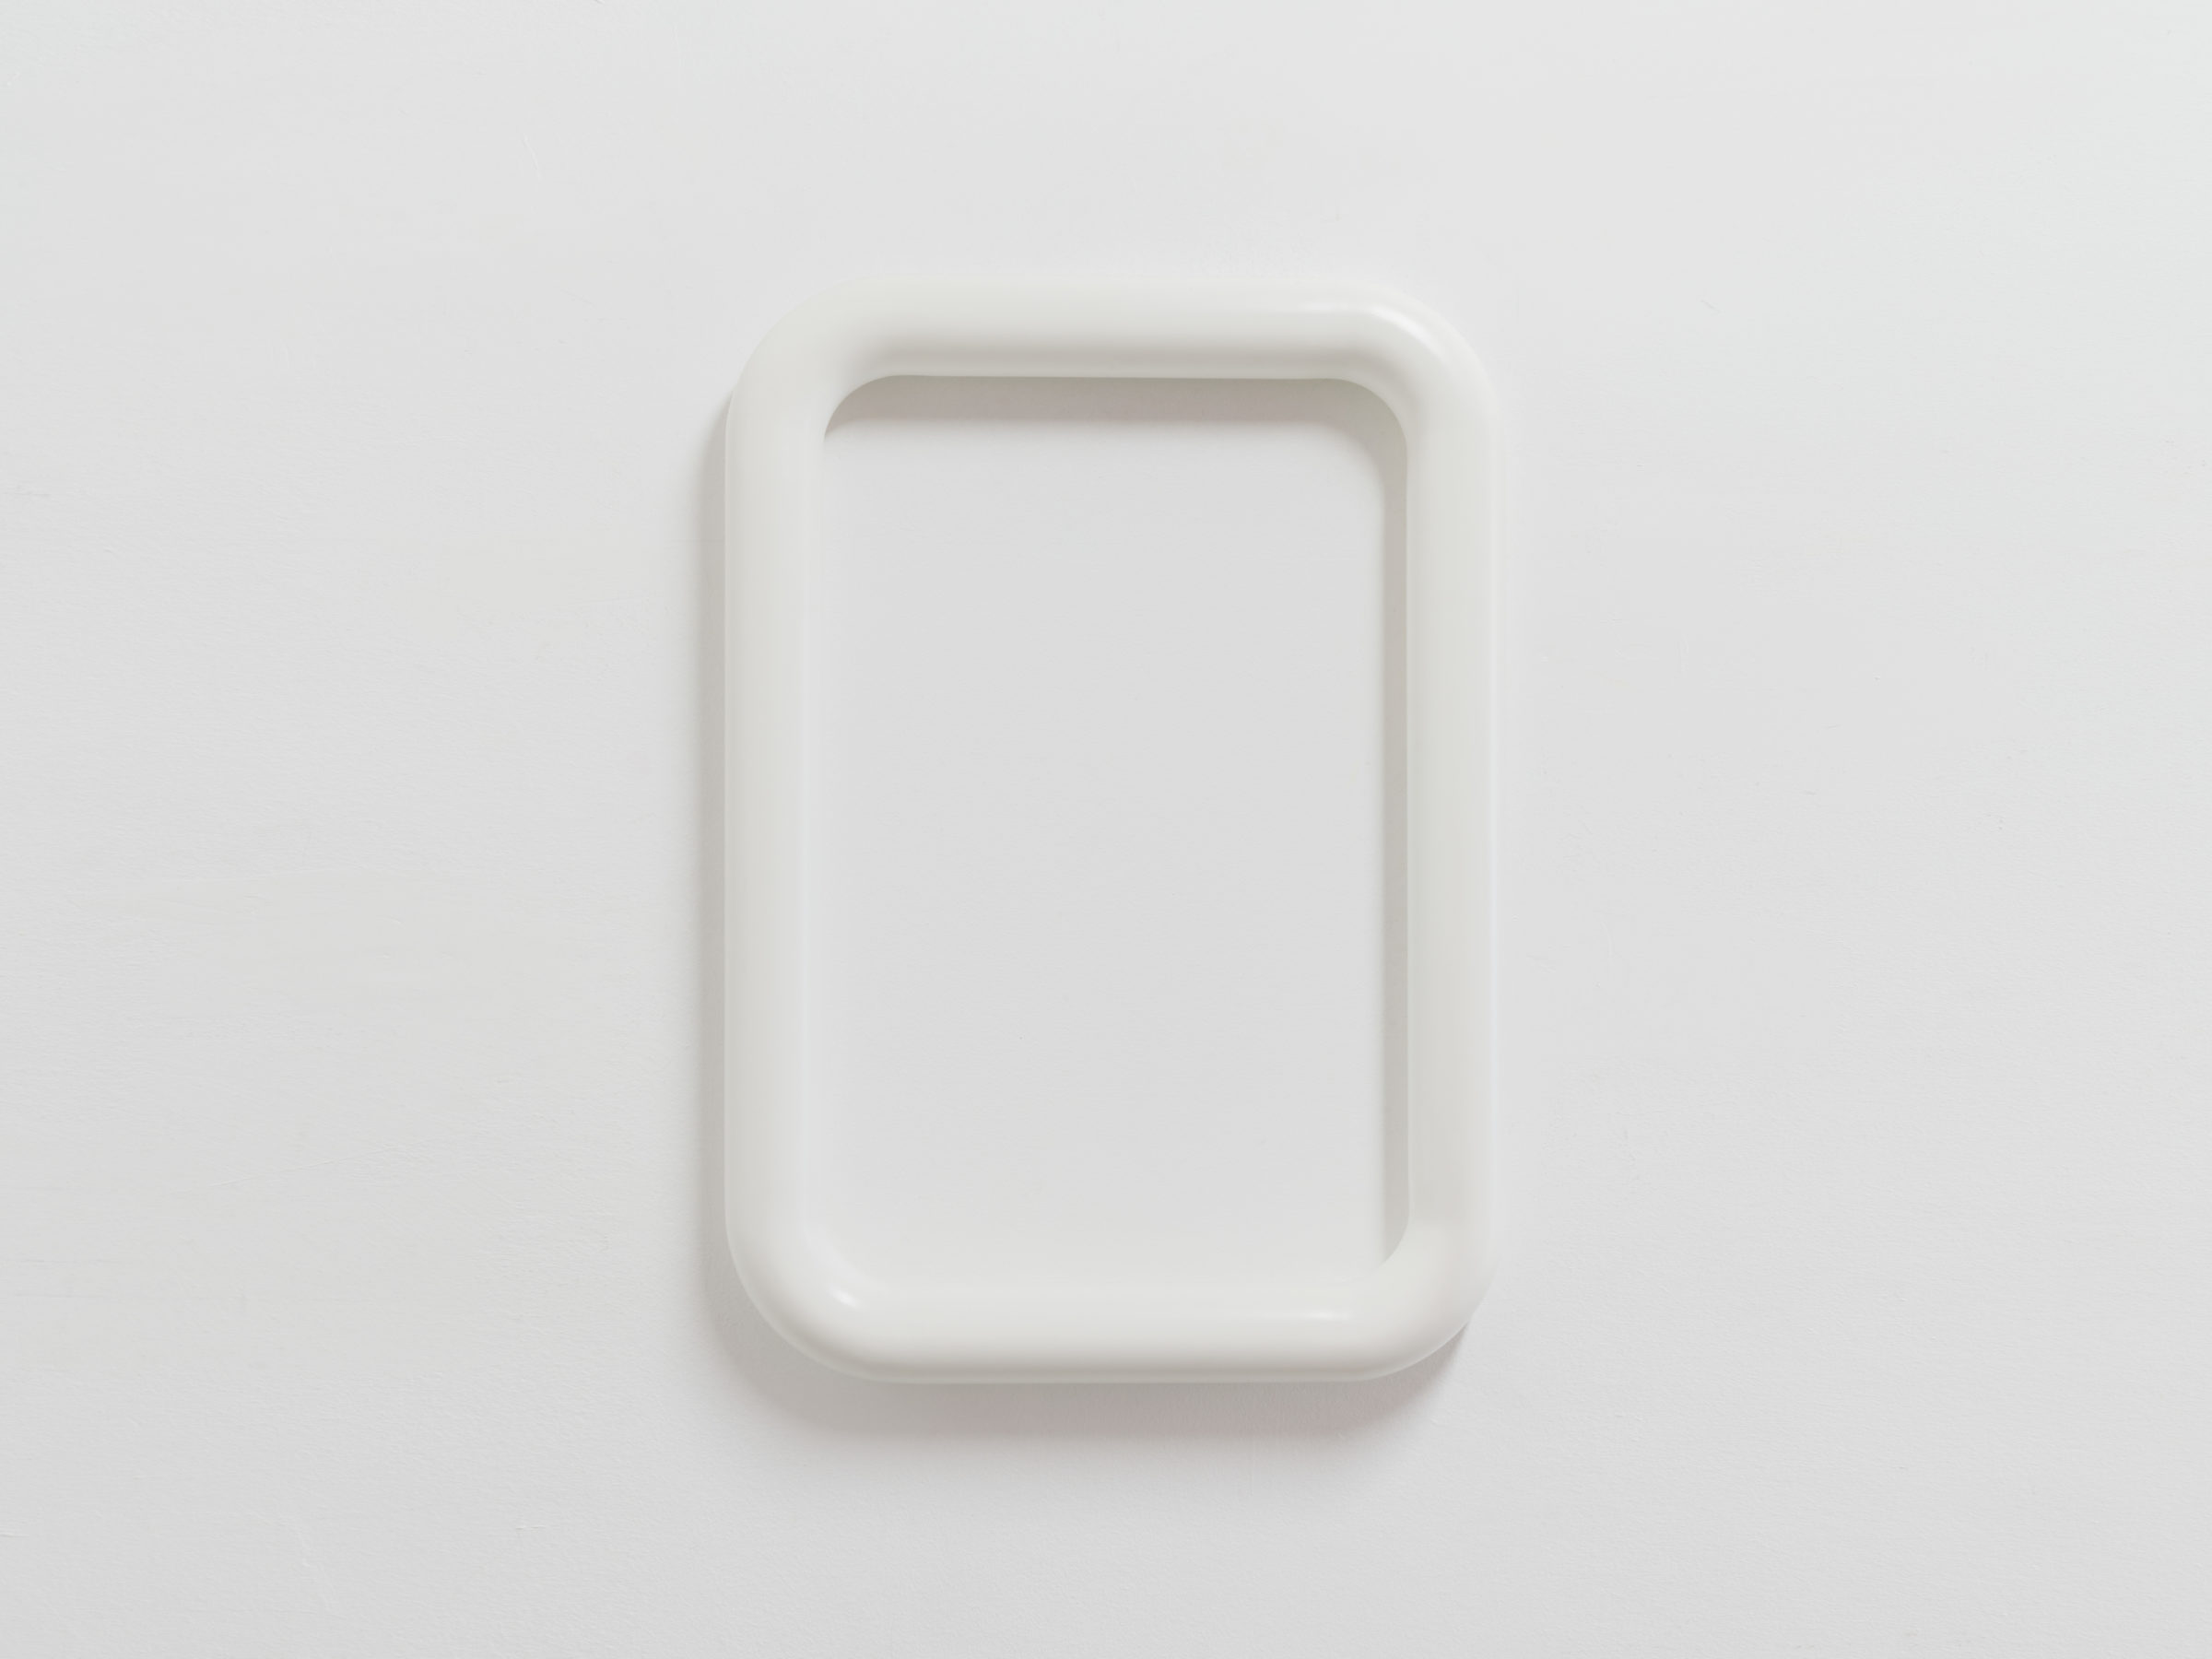 Tobias Hoffkecht, Big Boat, 2018, 60x80x8 cm